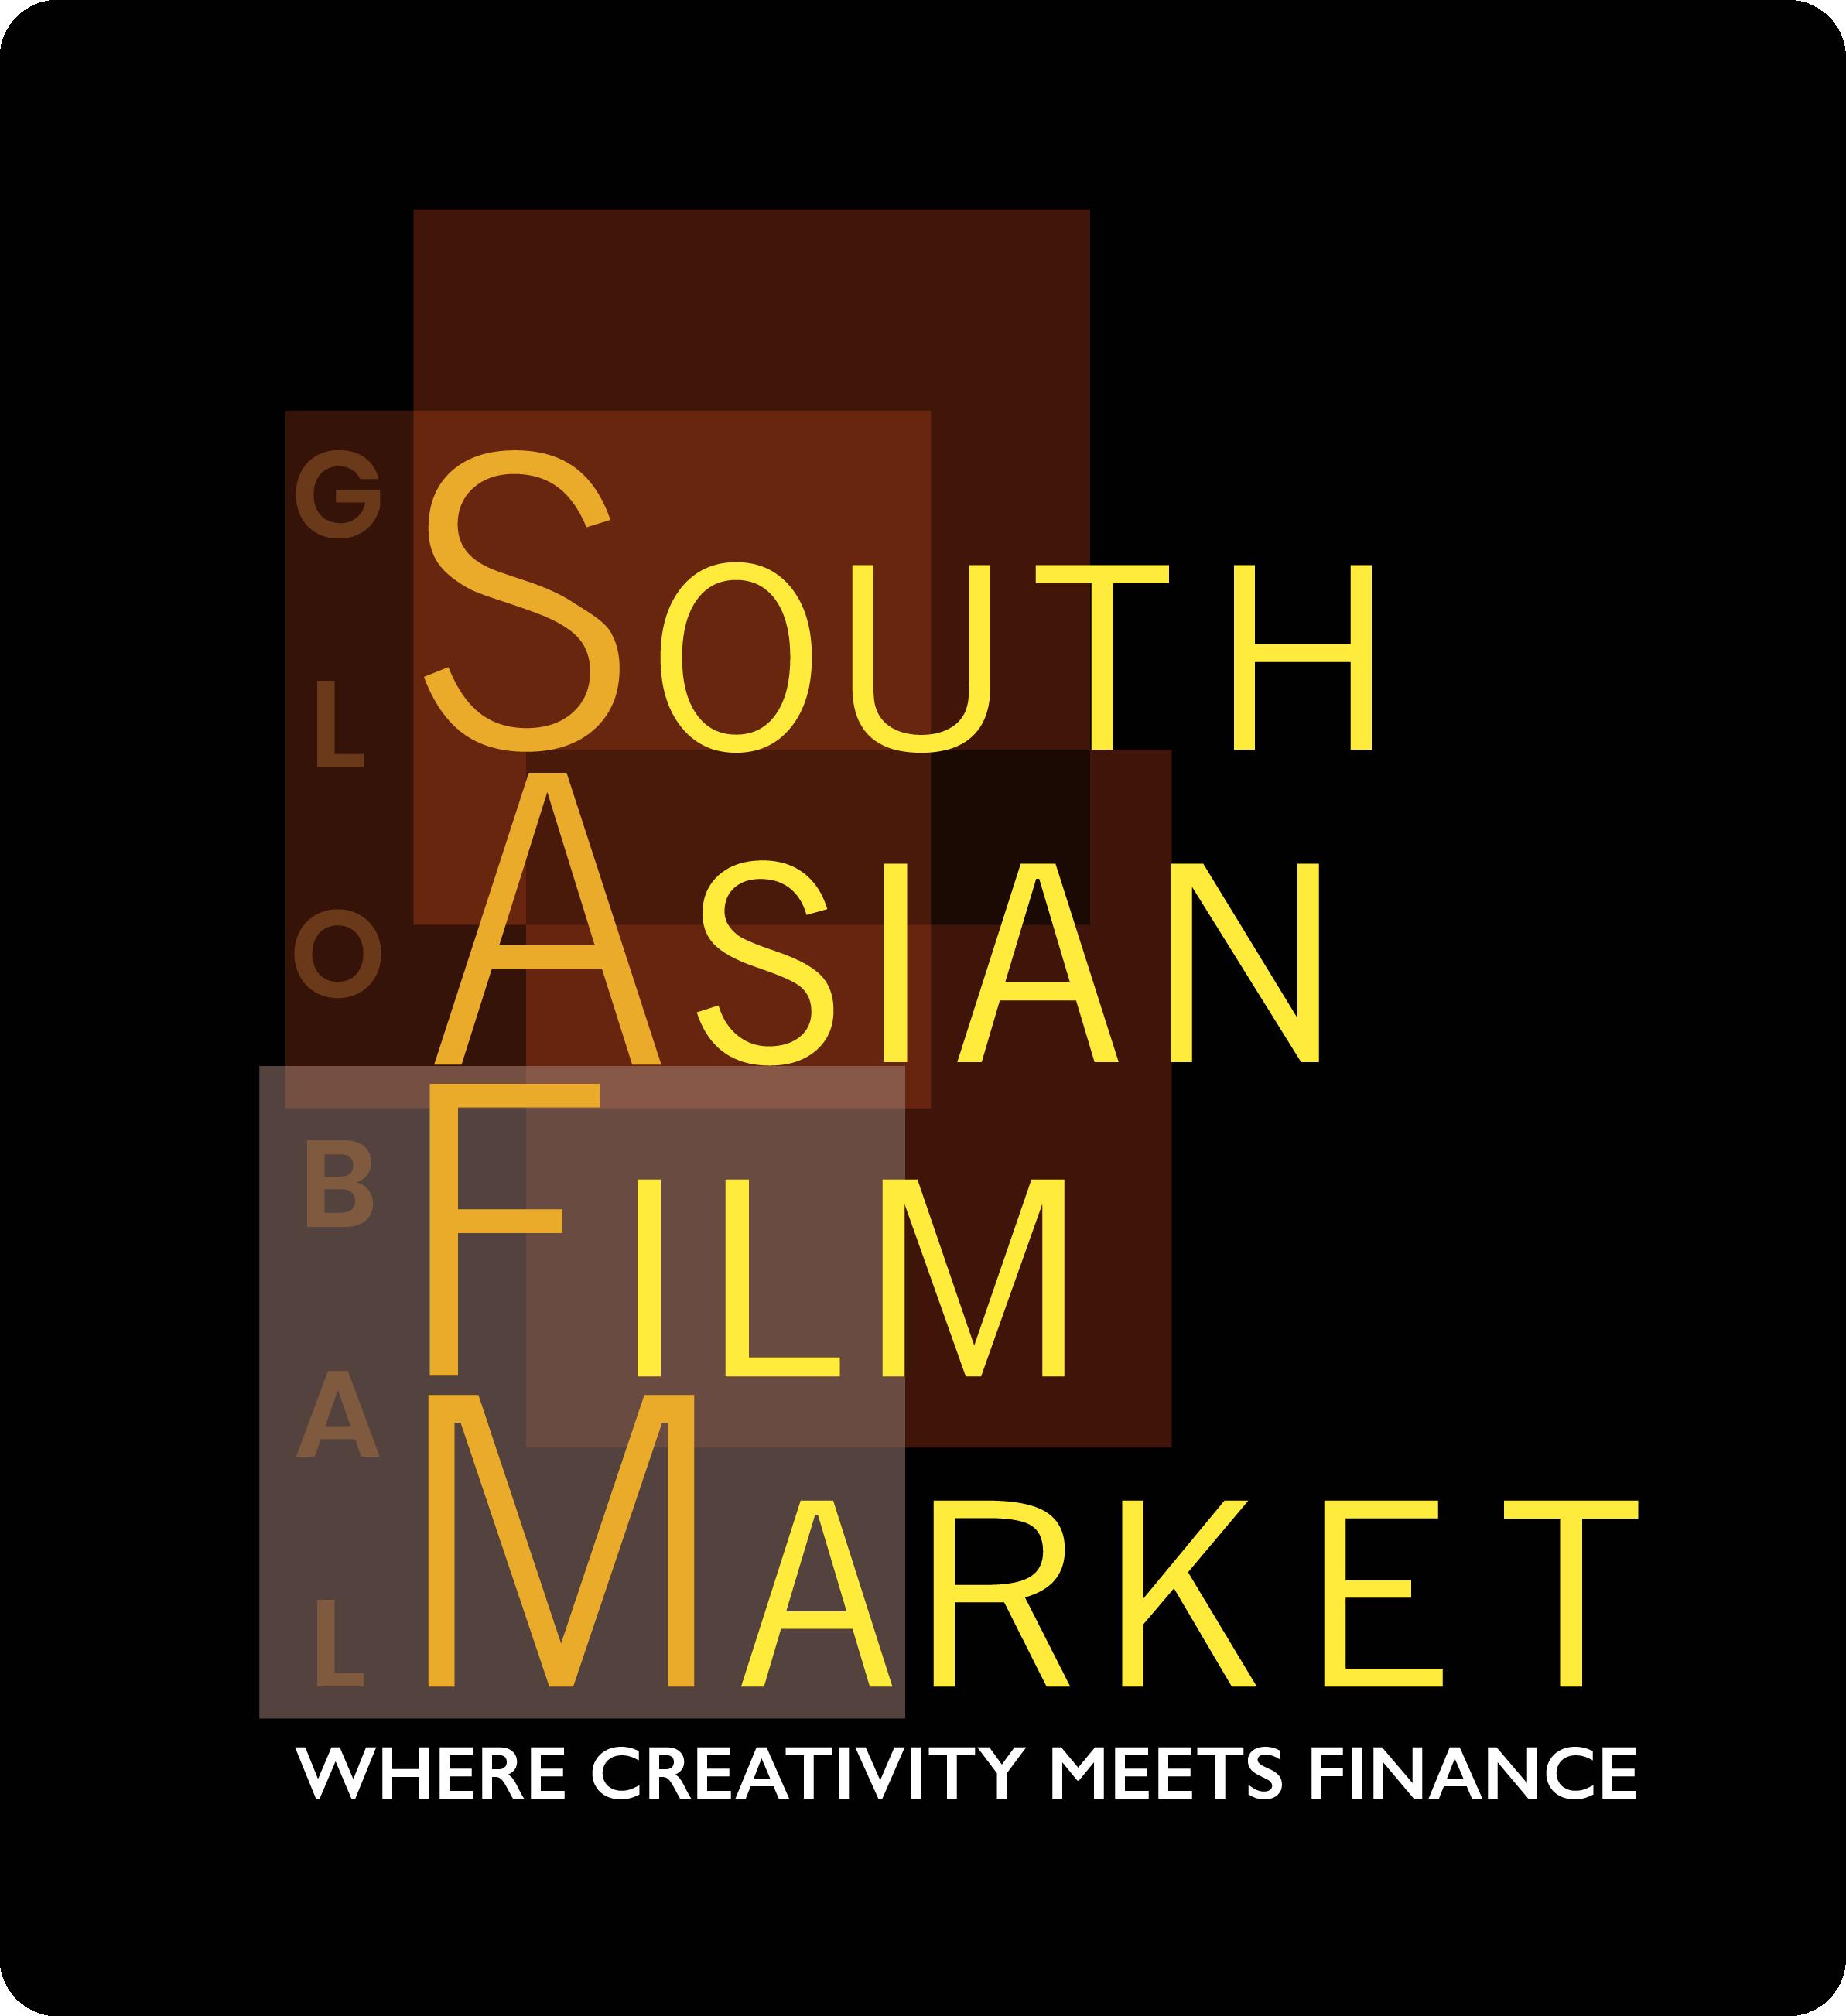 South Asian Film Market Global